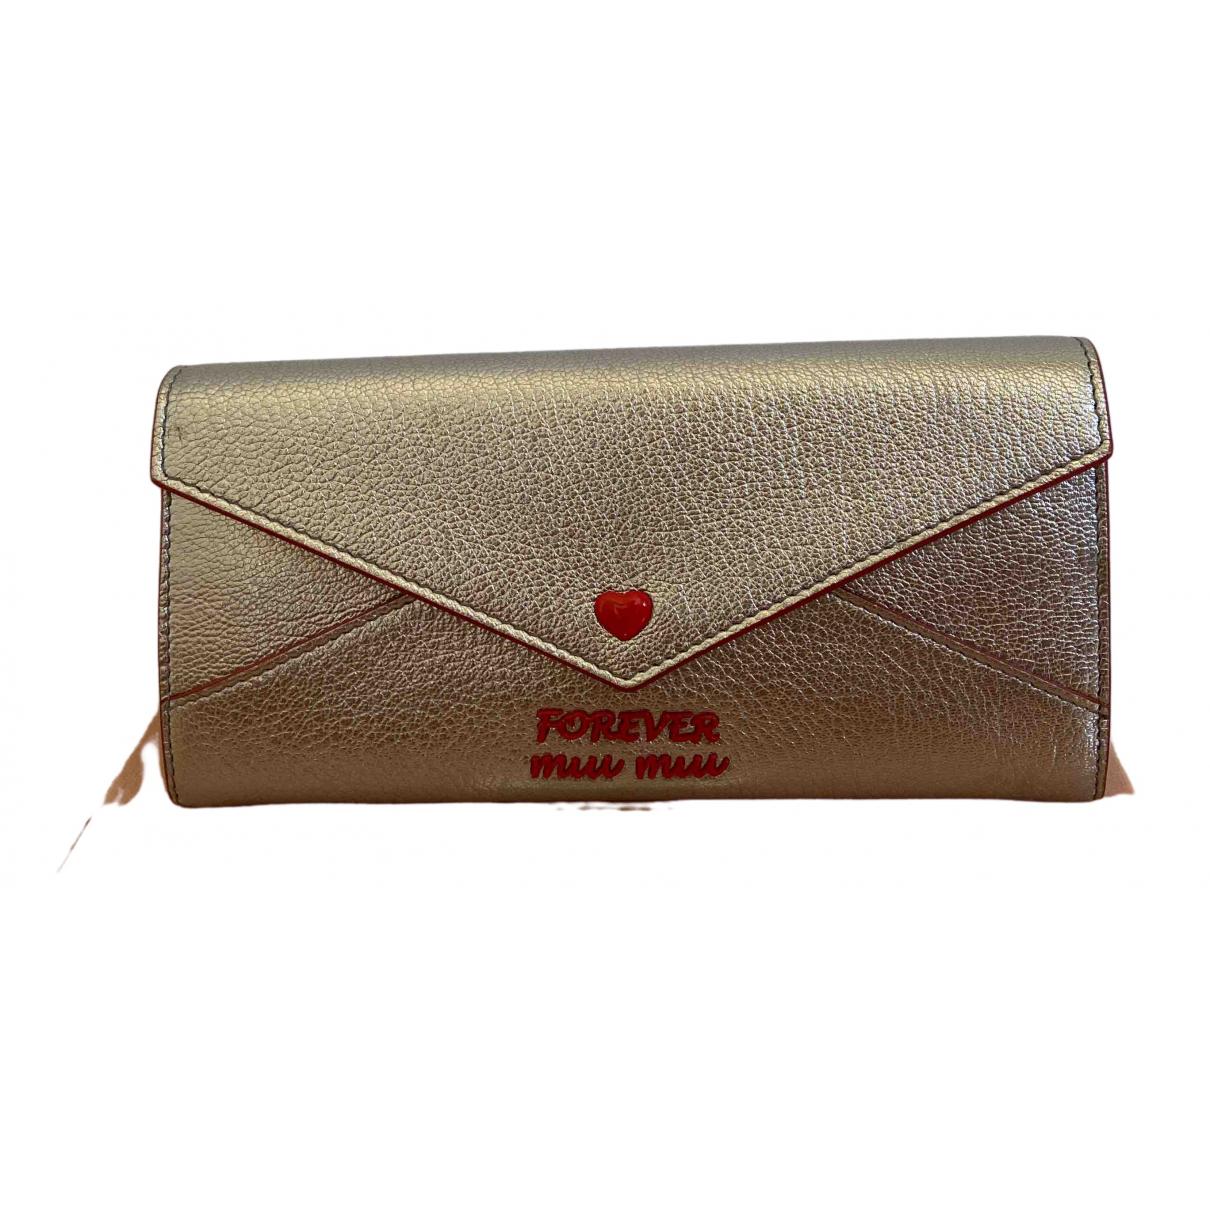 Miu Miu \N Silver Leather wallet for Women \N